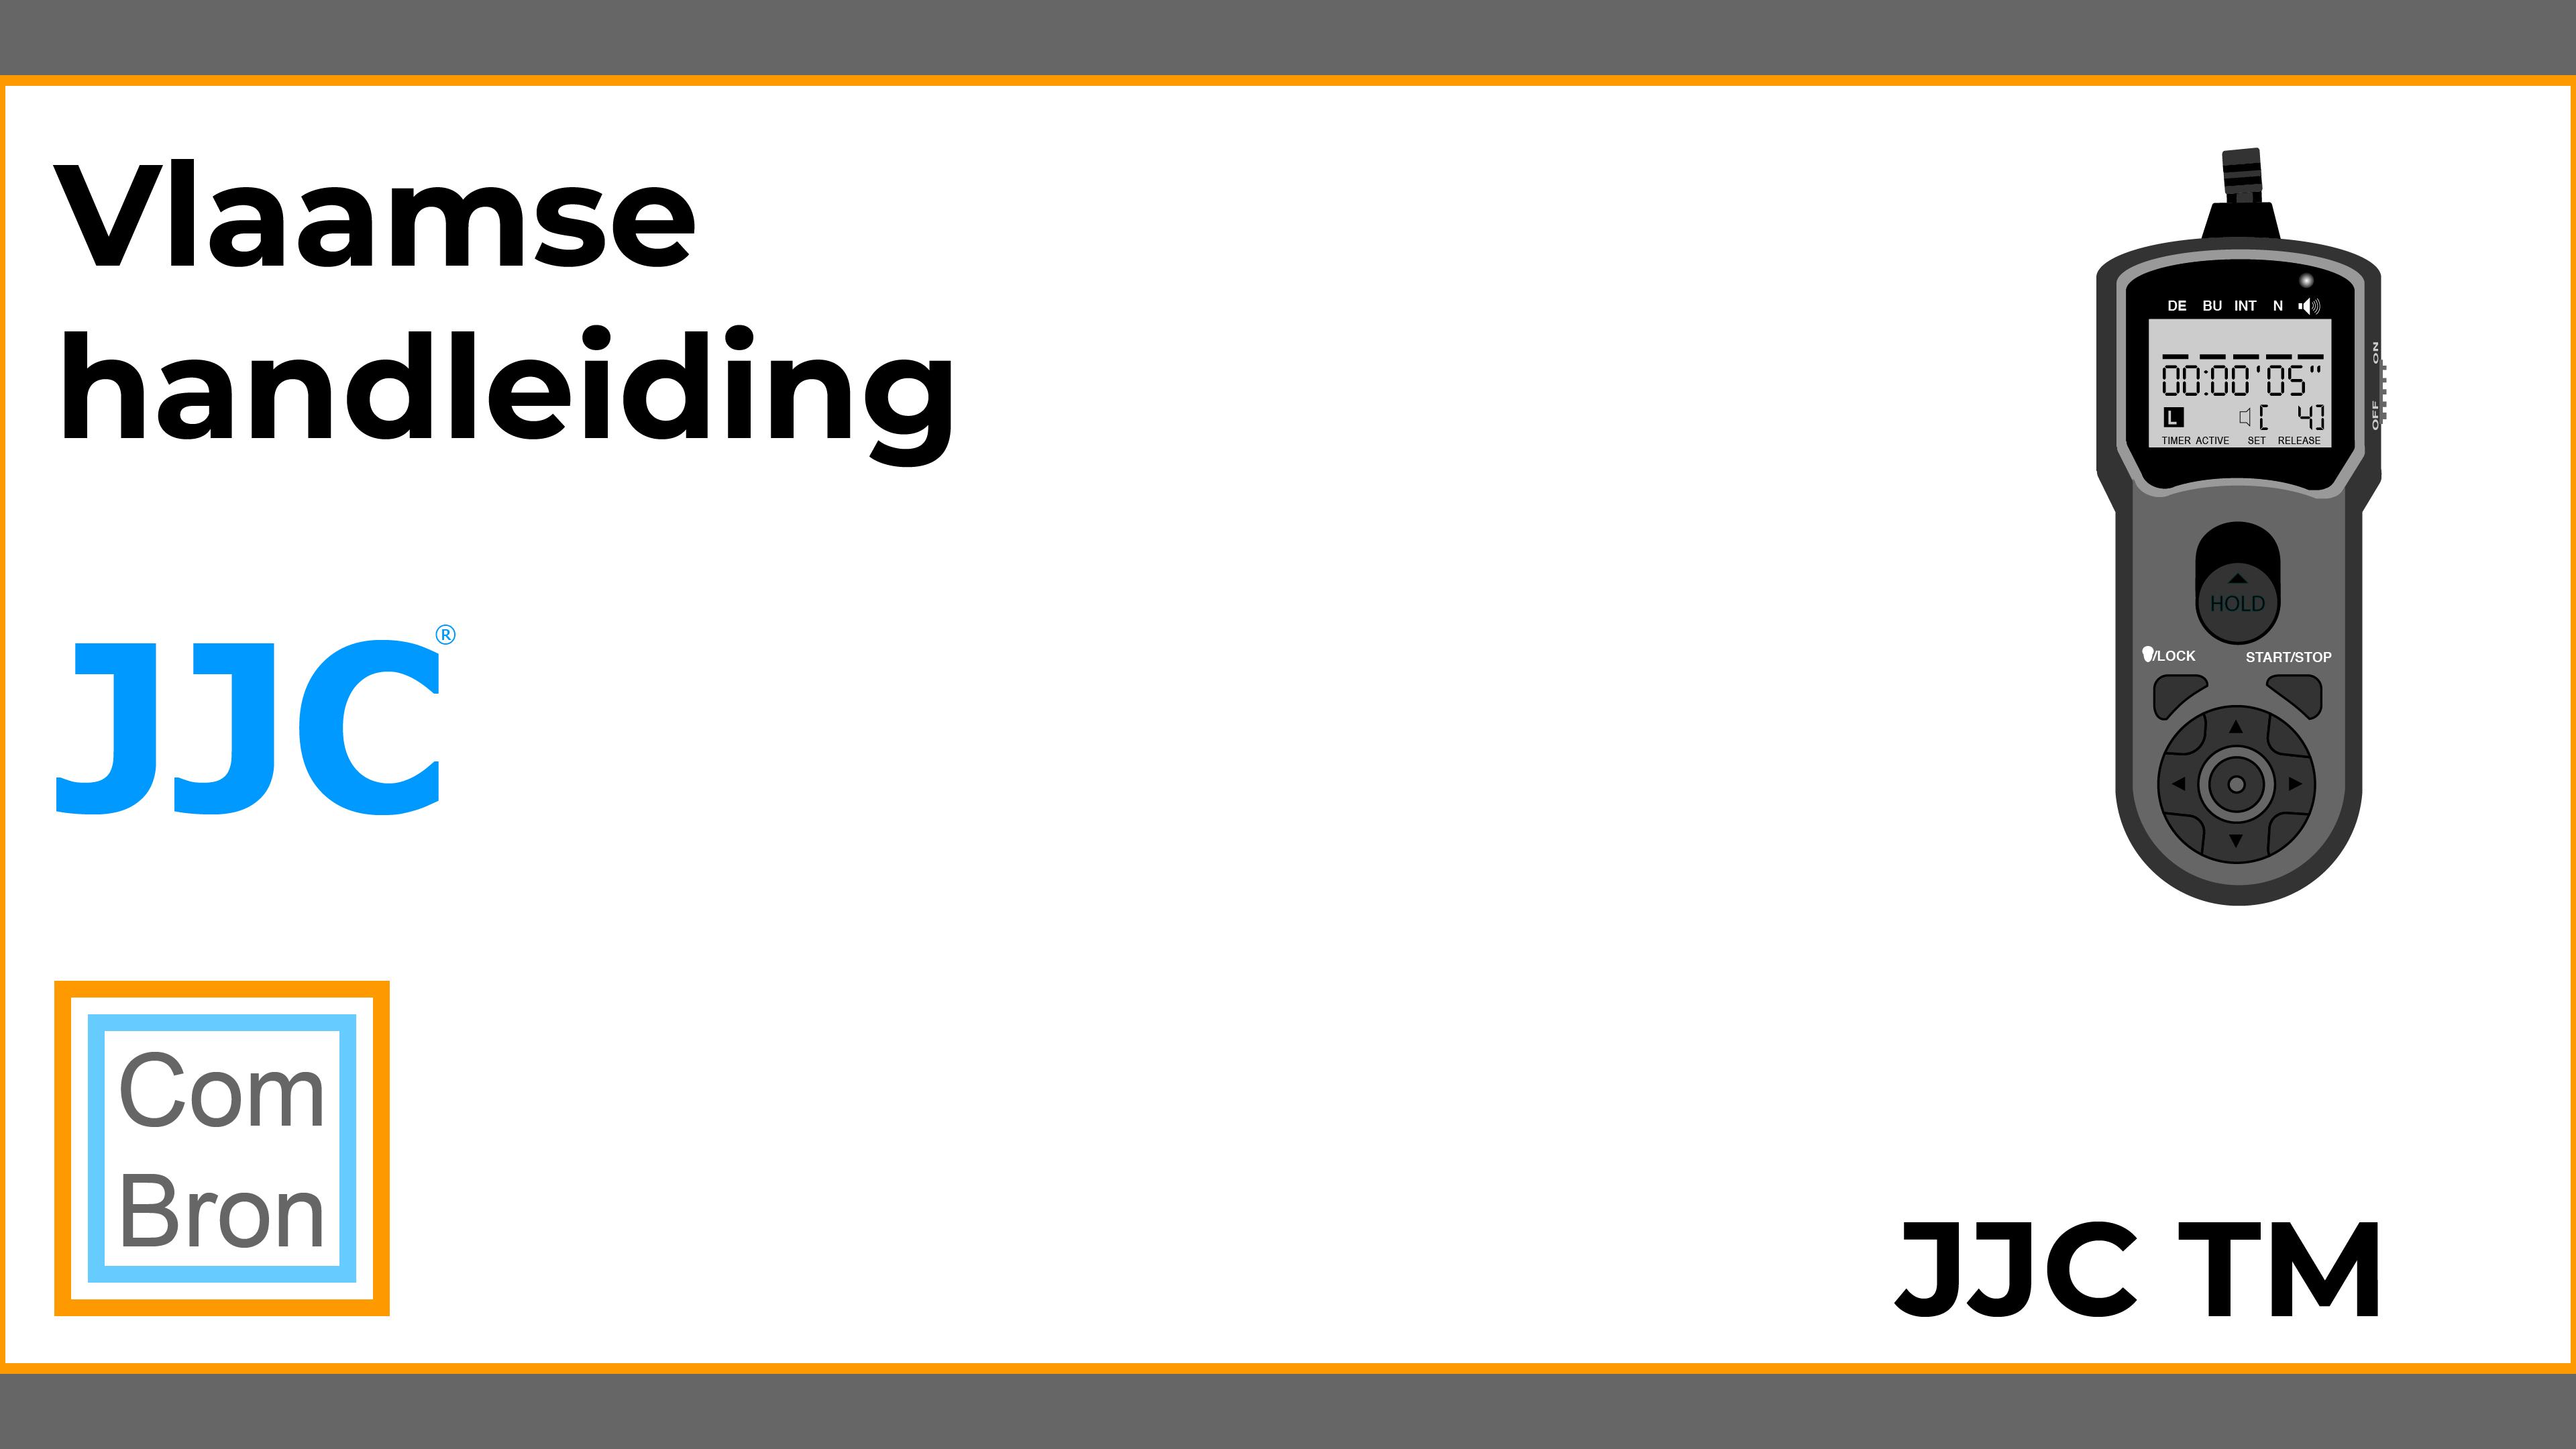 Vlaamse handleiding JJC TM.